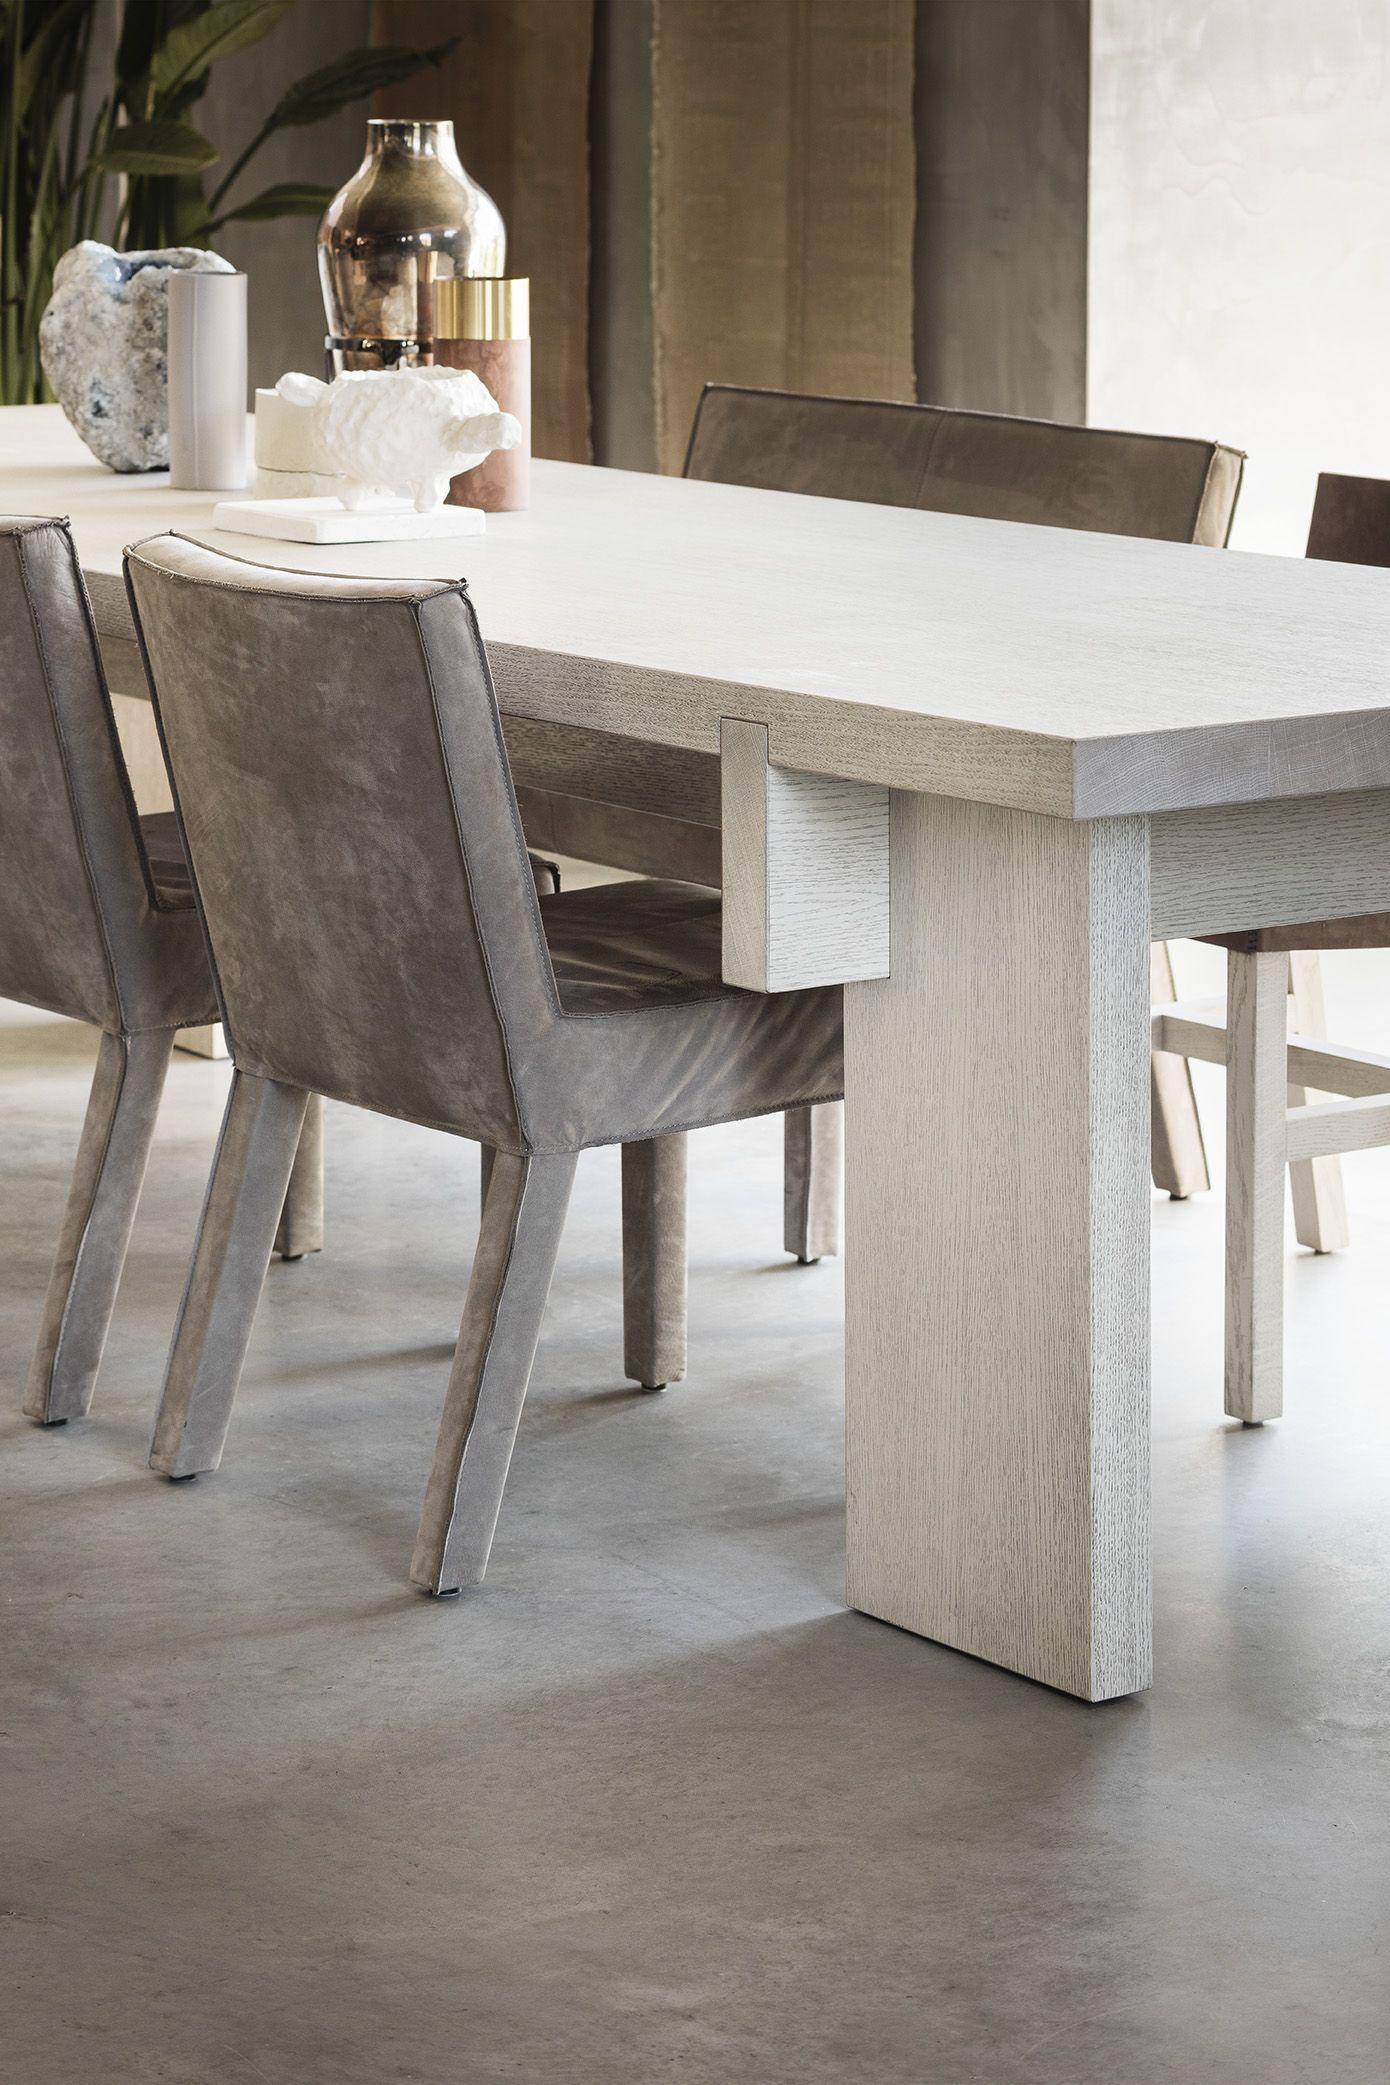 Raaf dining table saar dining chair piet boon